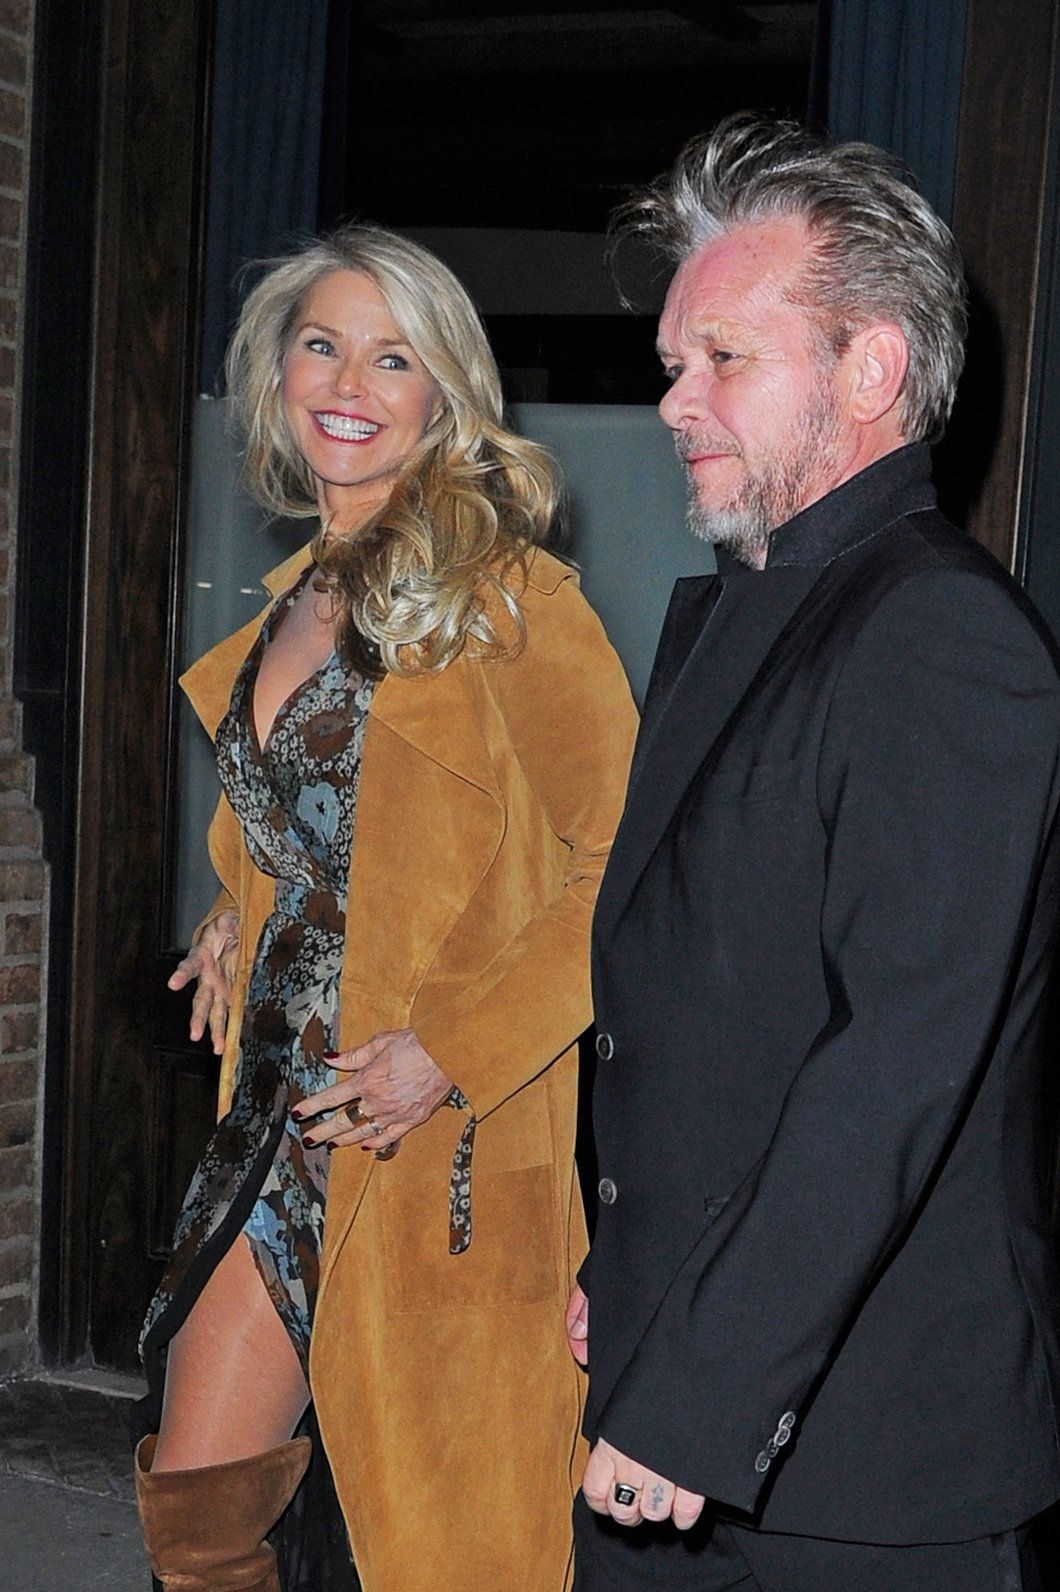 Christie Brinkley celebrates her 62nd birthday in New York City with her boyfriend, John Mellencamp.